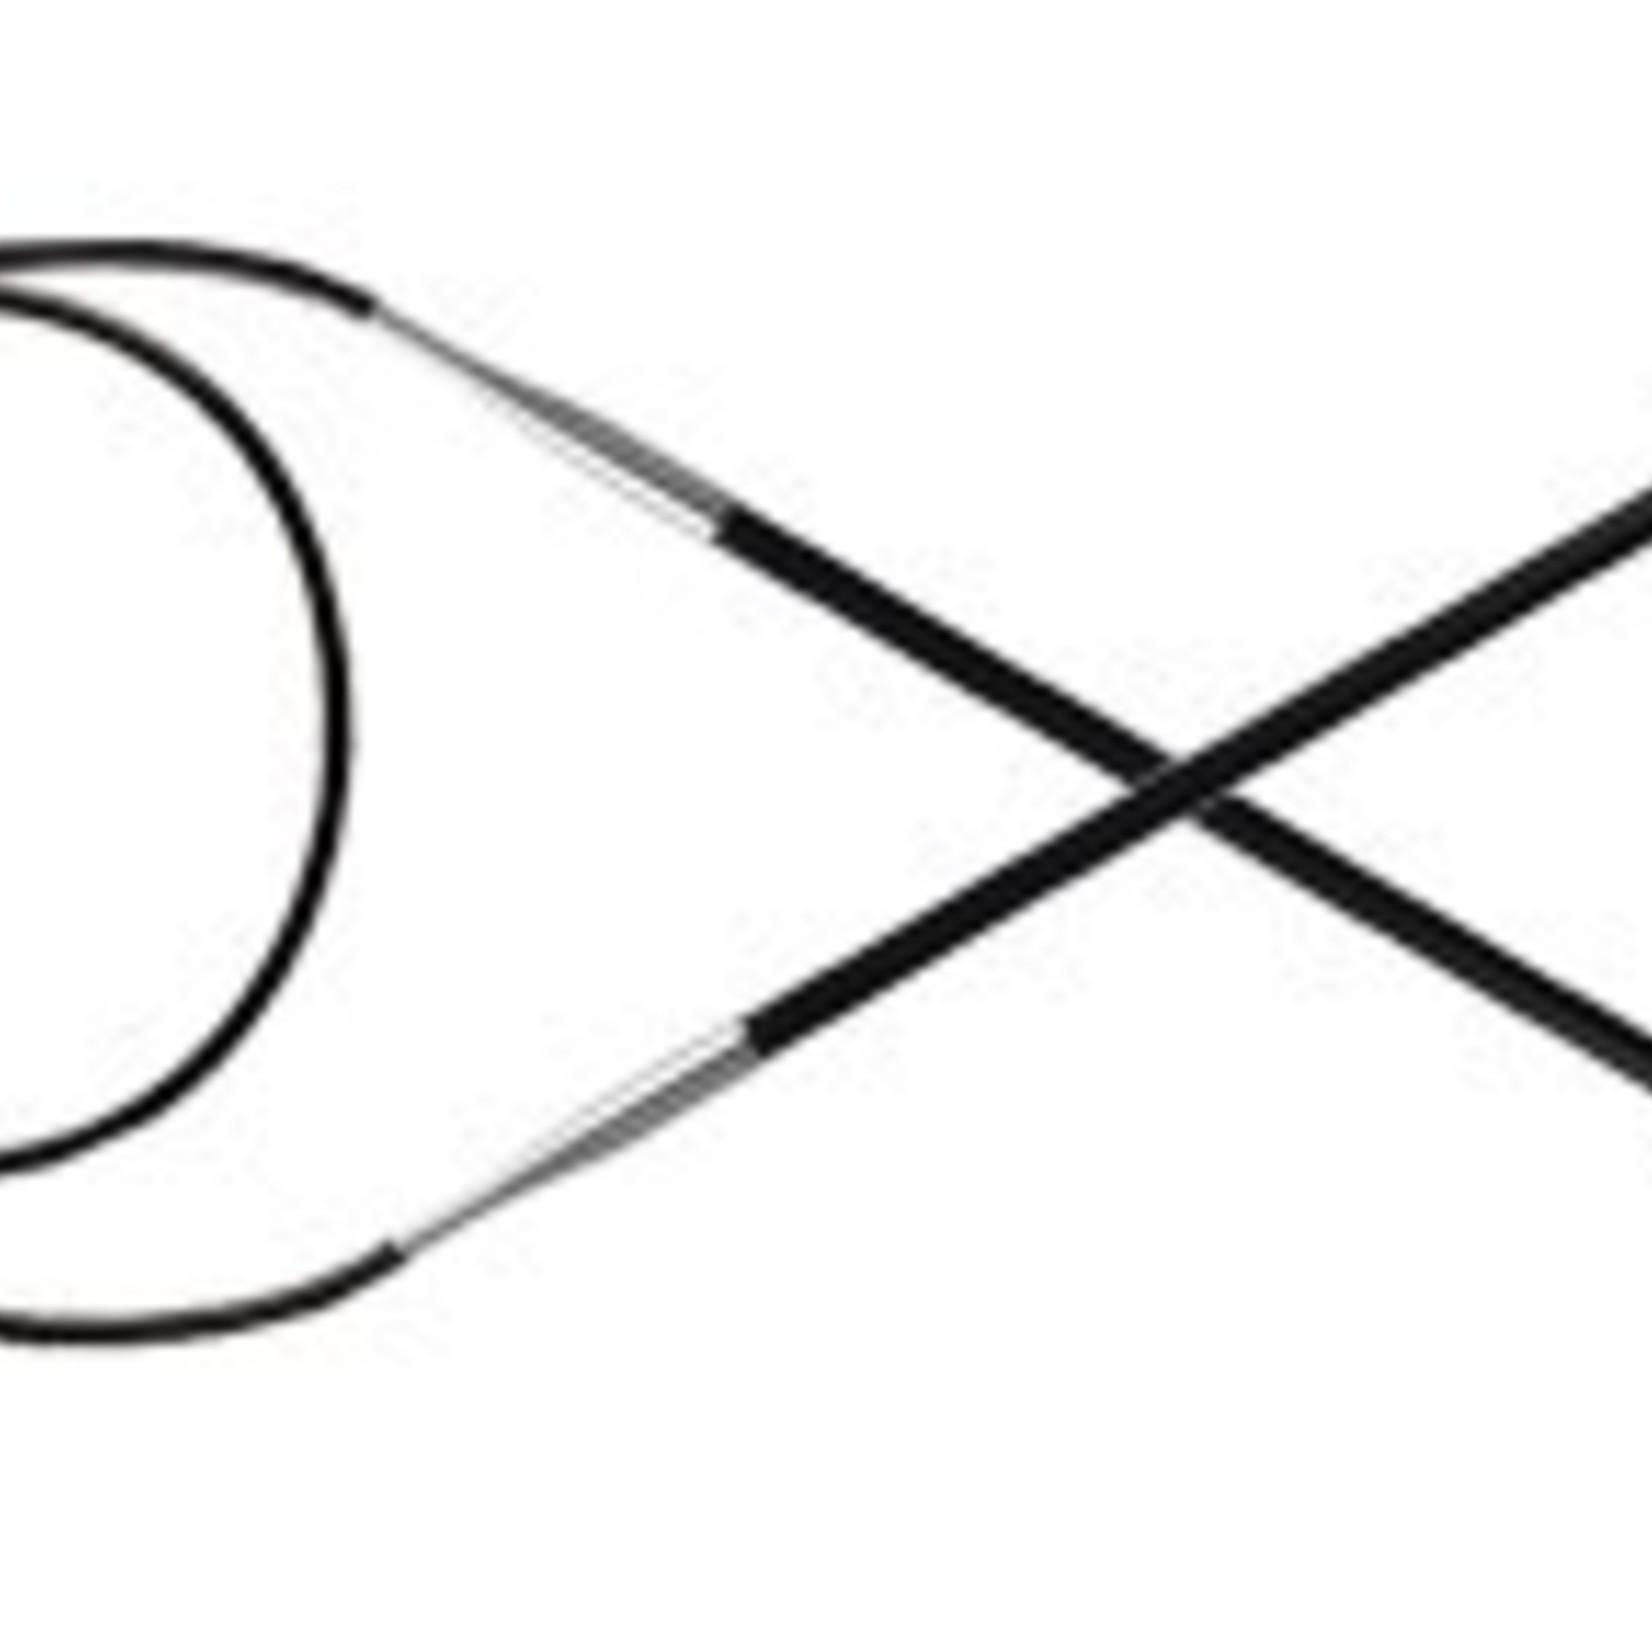 Knitter's Pride 1 Karbonz Circular 24